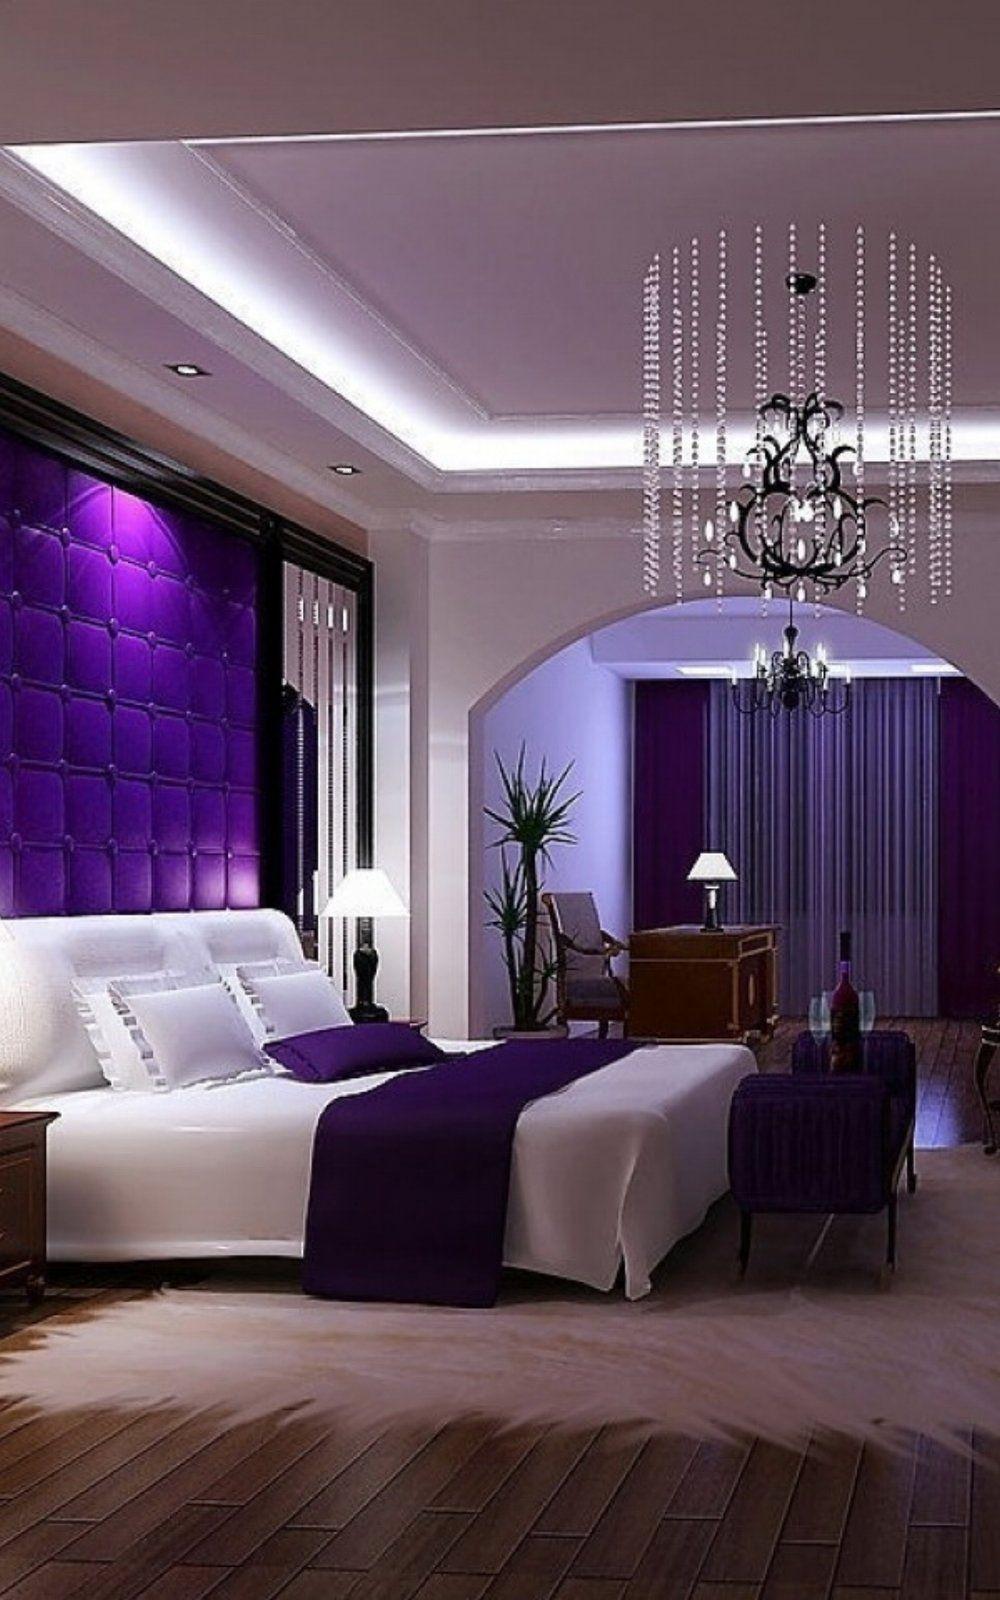 23 Amazing Romantic Master Bedroom Design Ideas Purple Master Bedroom Purple Bedroom Design Purple Bedrooms